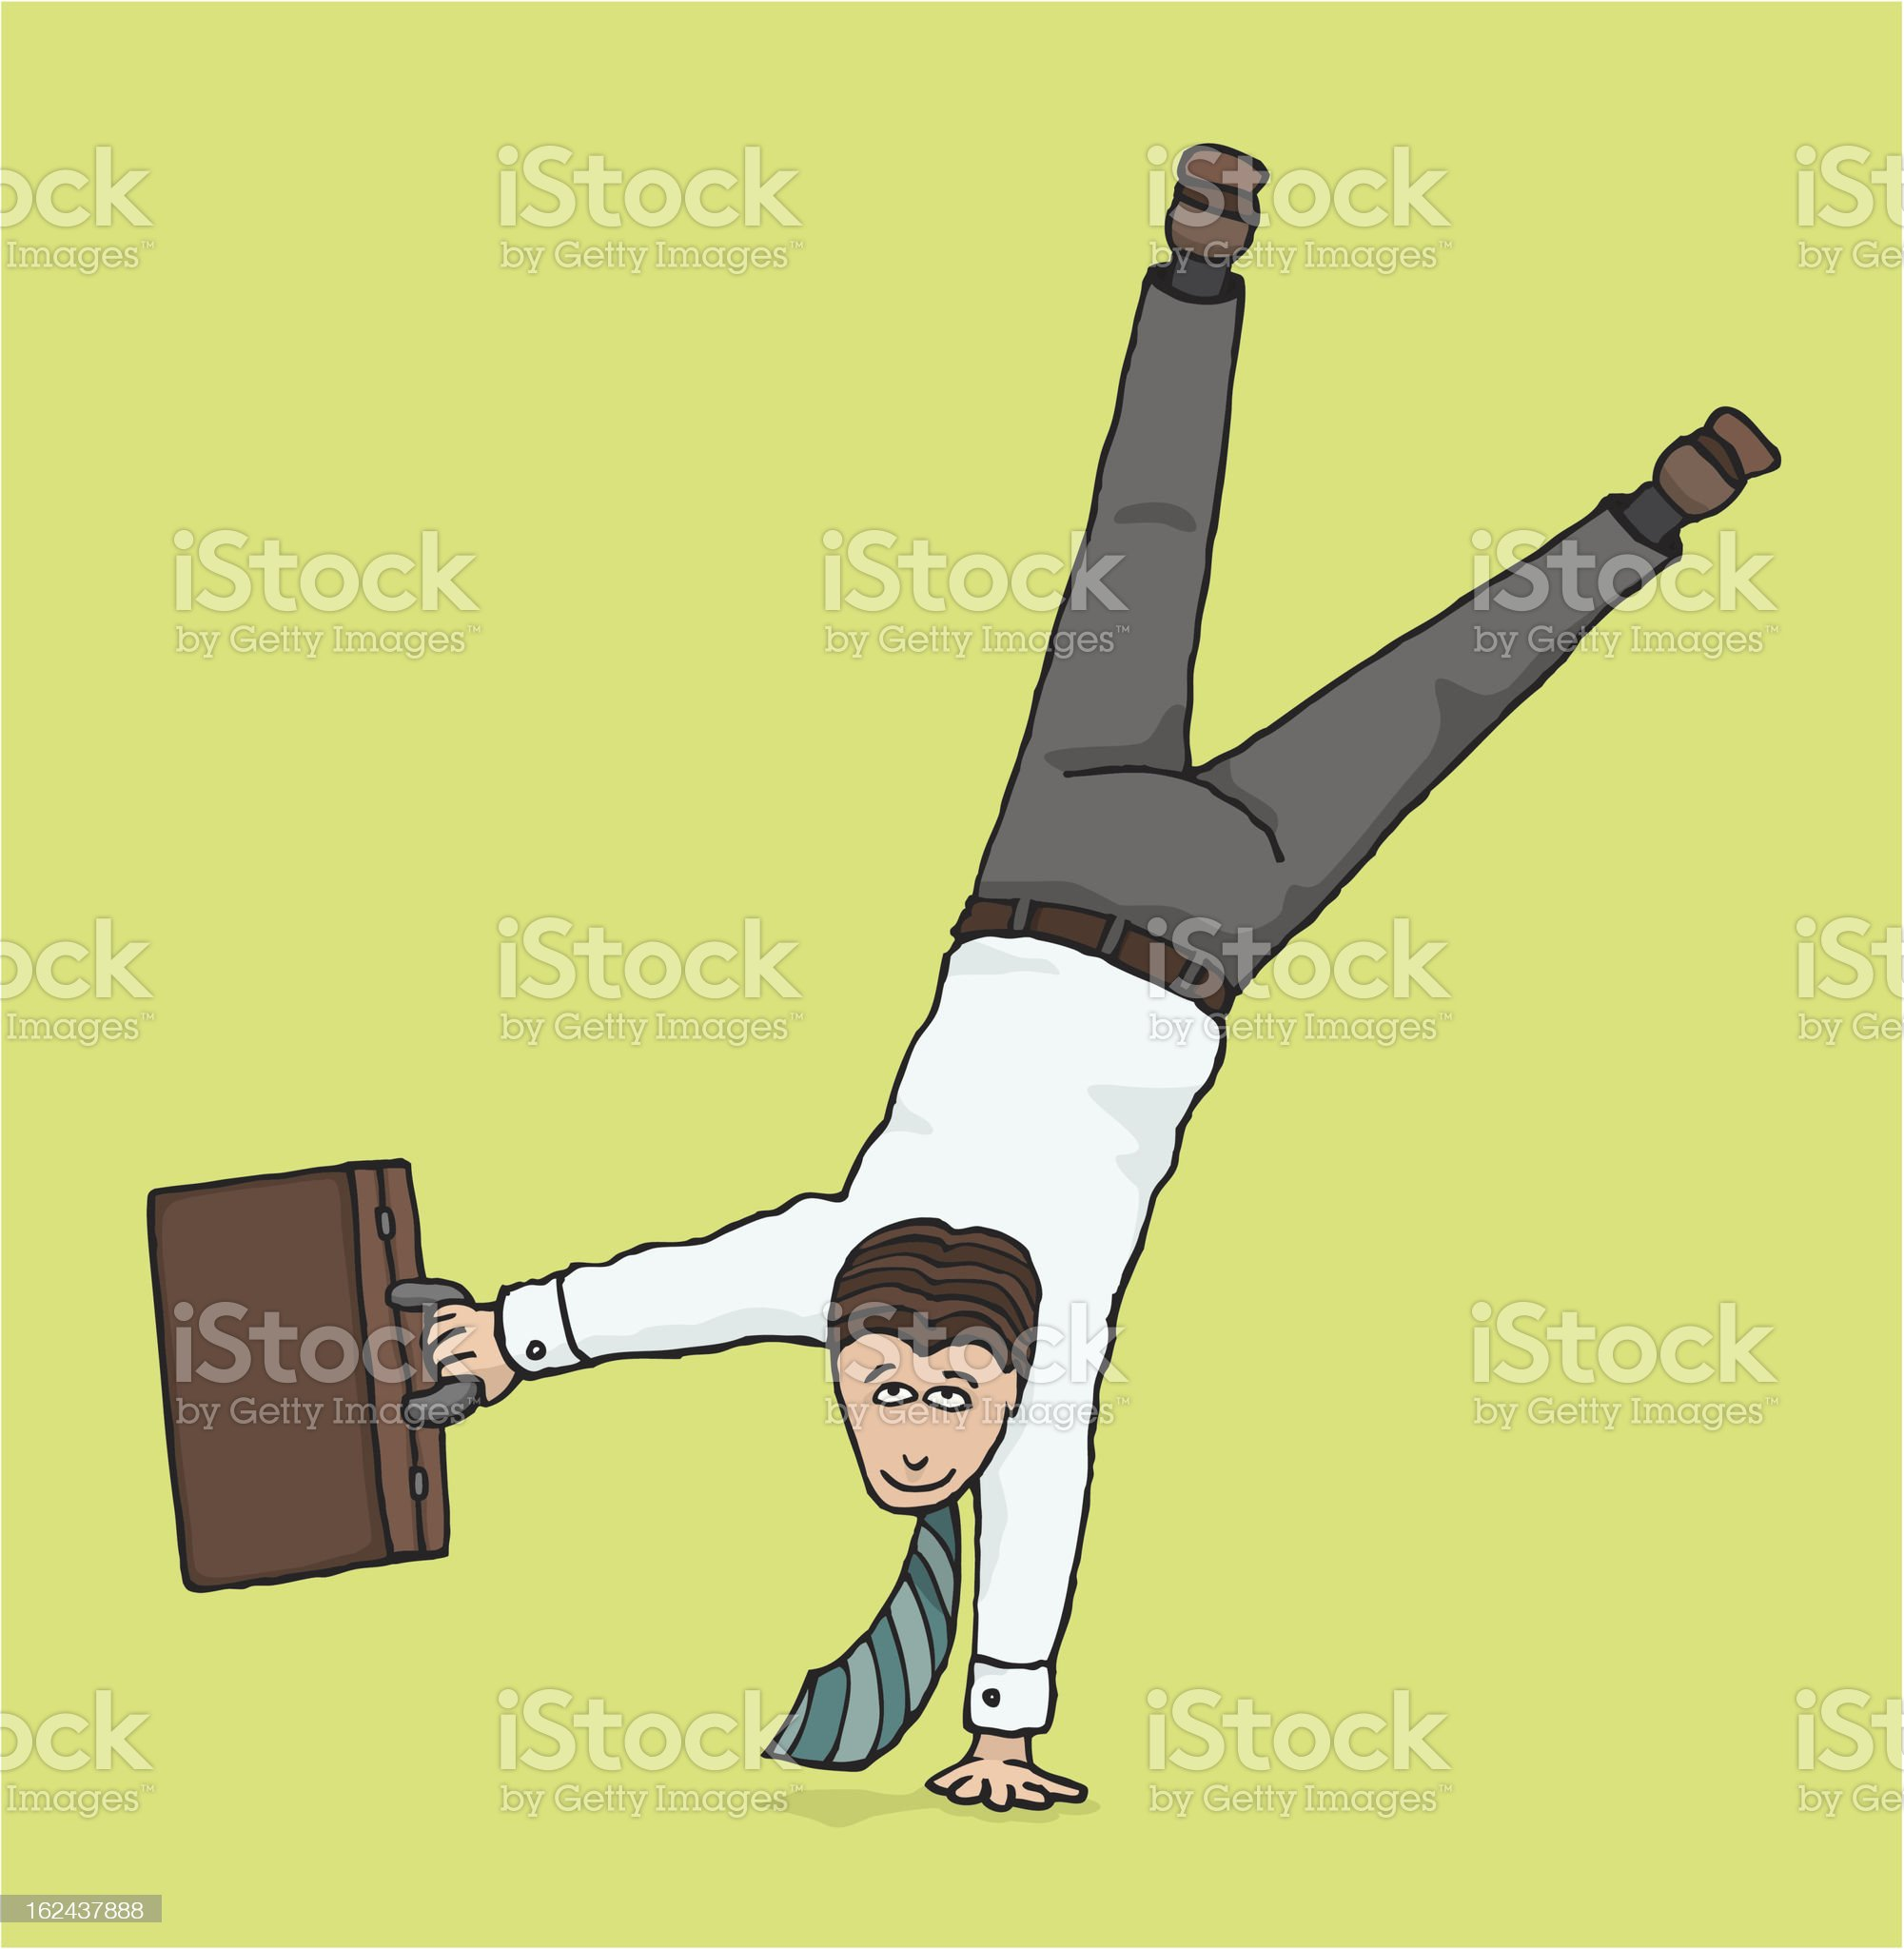 Agile businessman / Business upside down royalty-free stock vector art